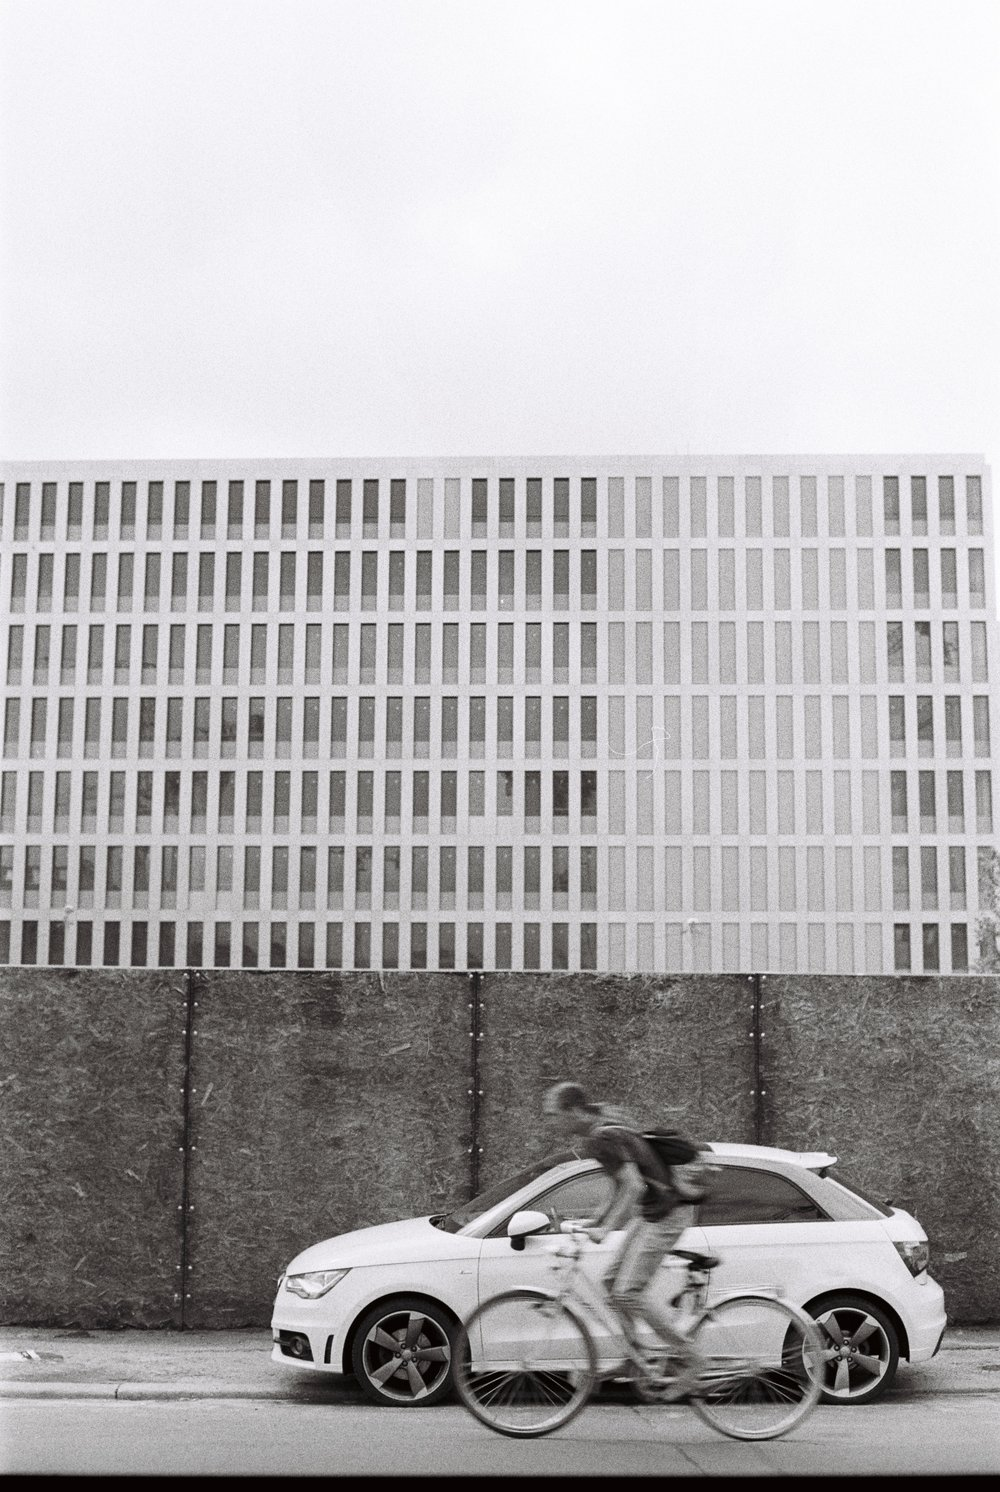 Audi, Berlin August 2015.